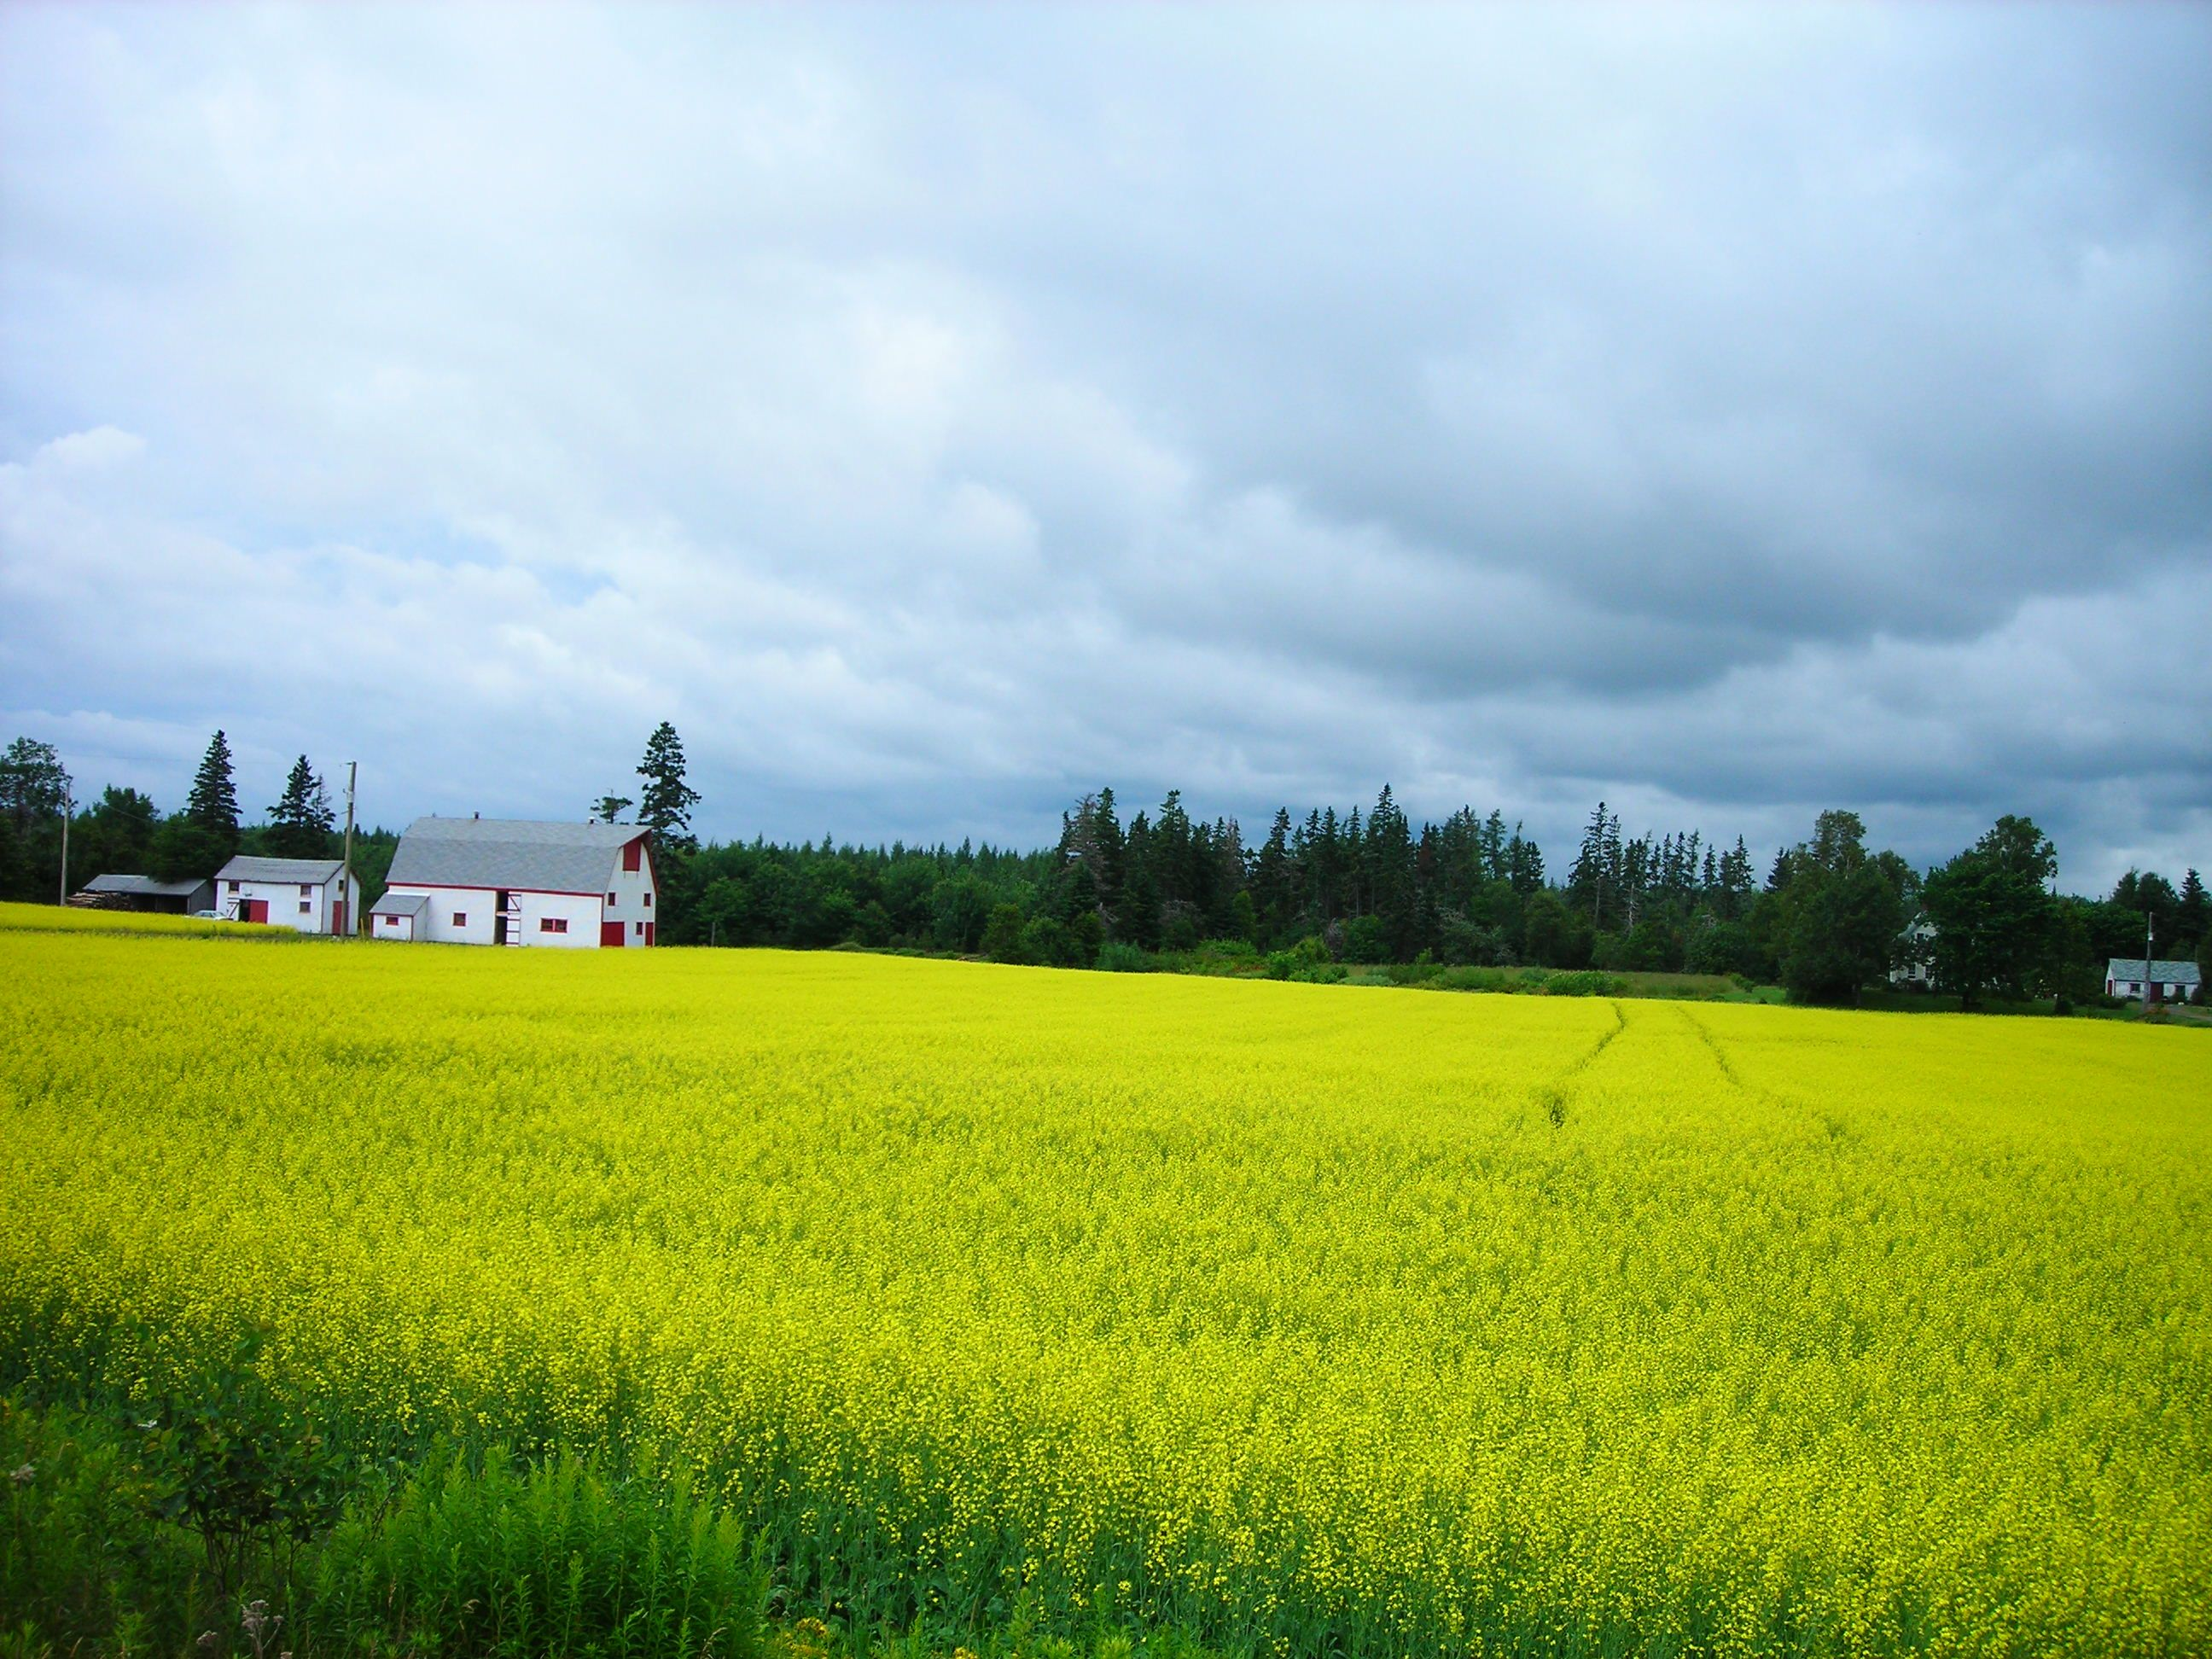 field of canola, Prince Edward Island, July, 2008